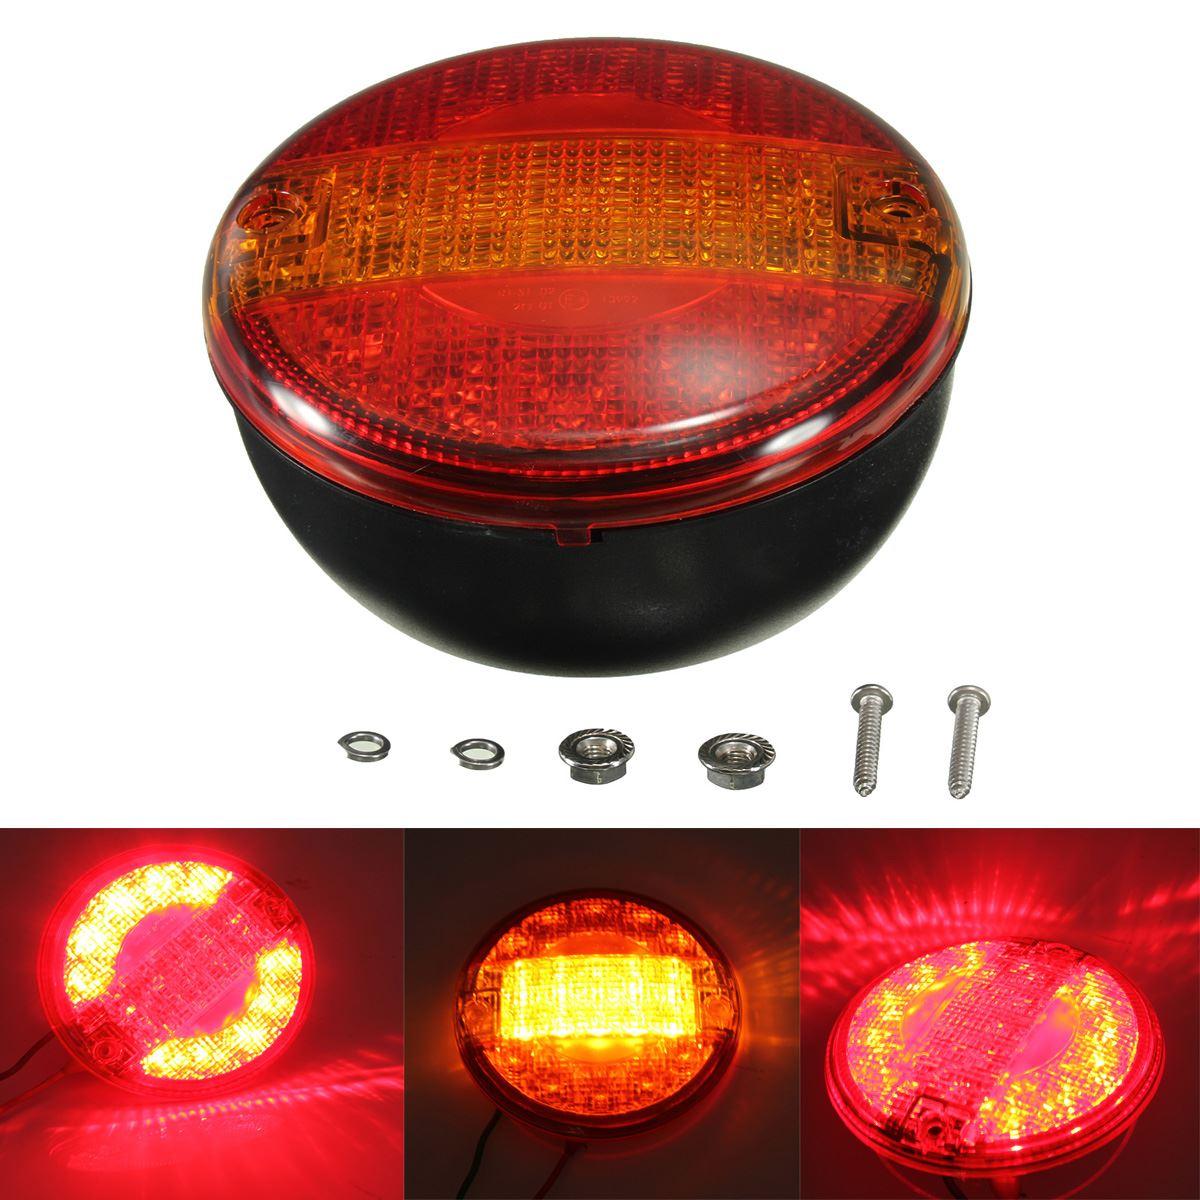 12 24V Universal LED Rear Tail Stop Indicator Light Round Truck Caravan E marker